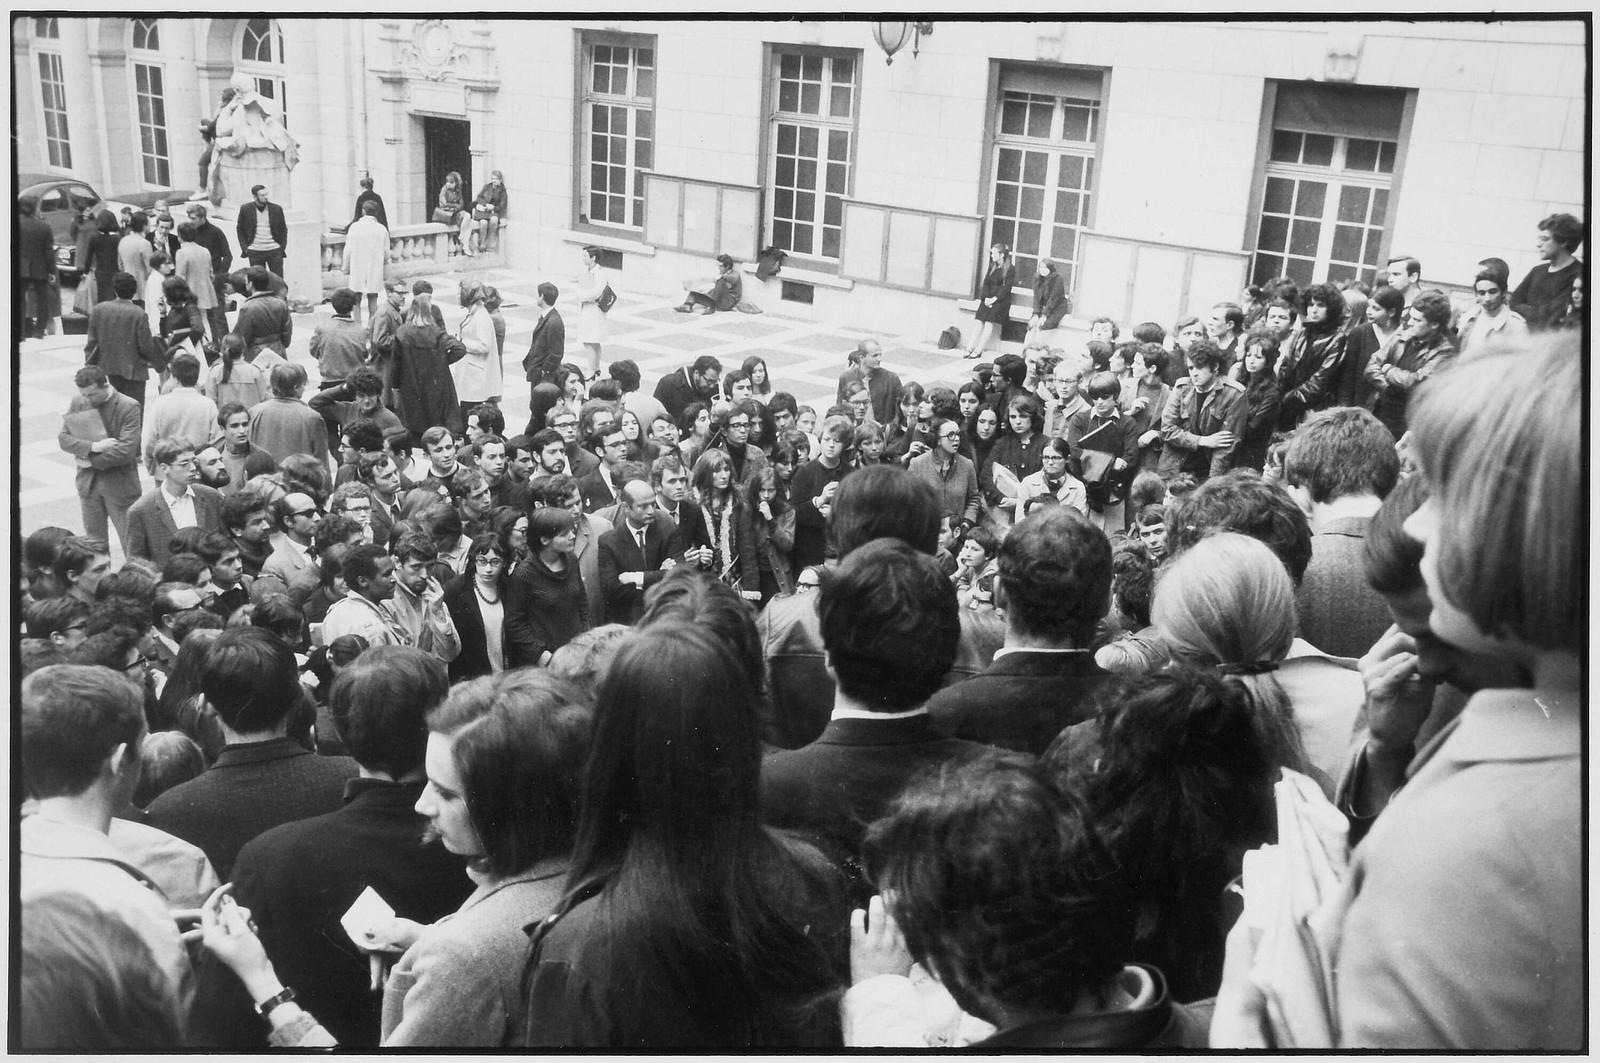 Митинг во дворе Сорбонны